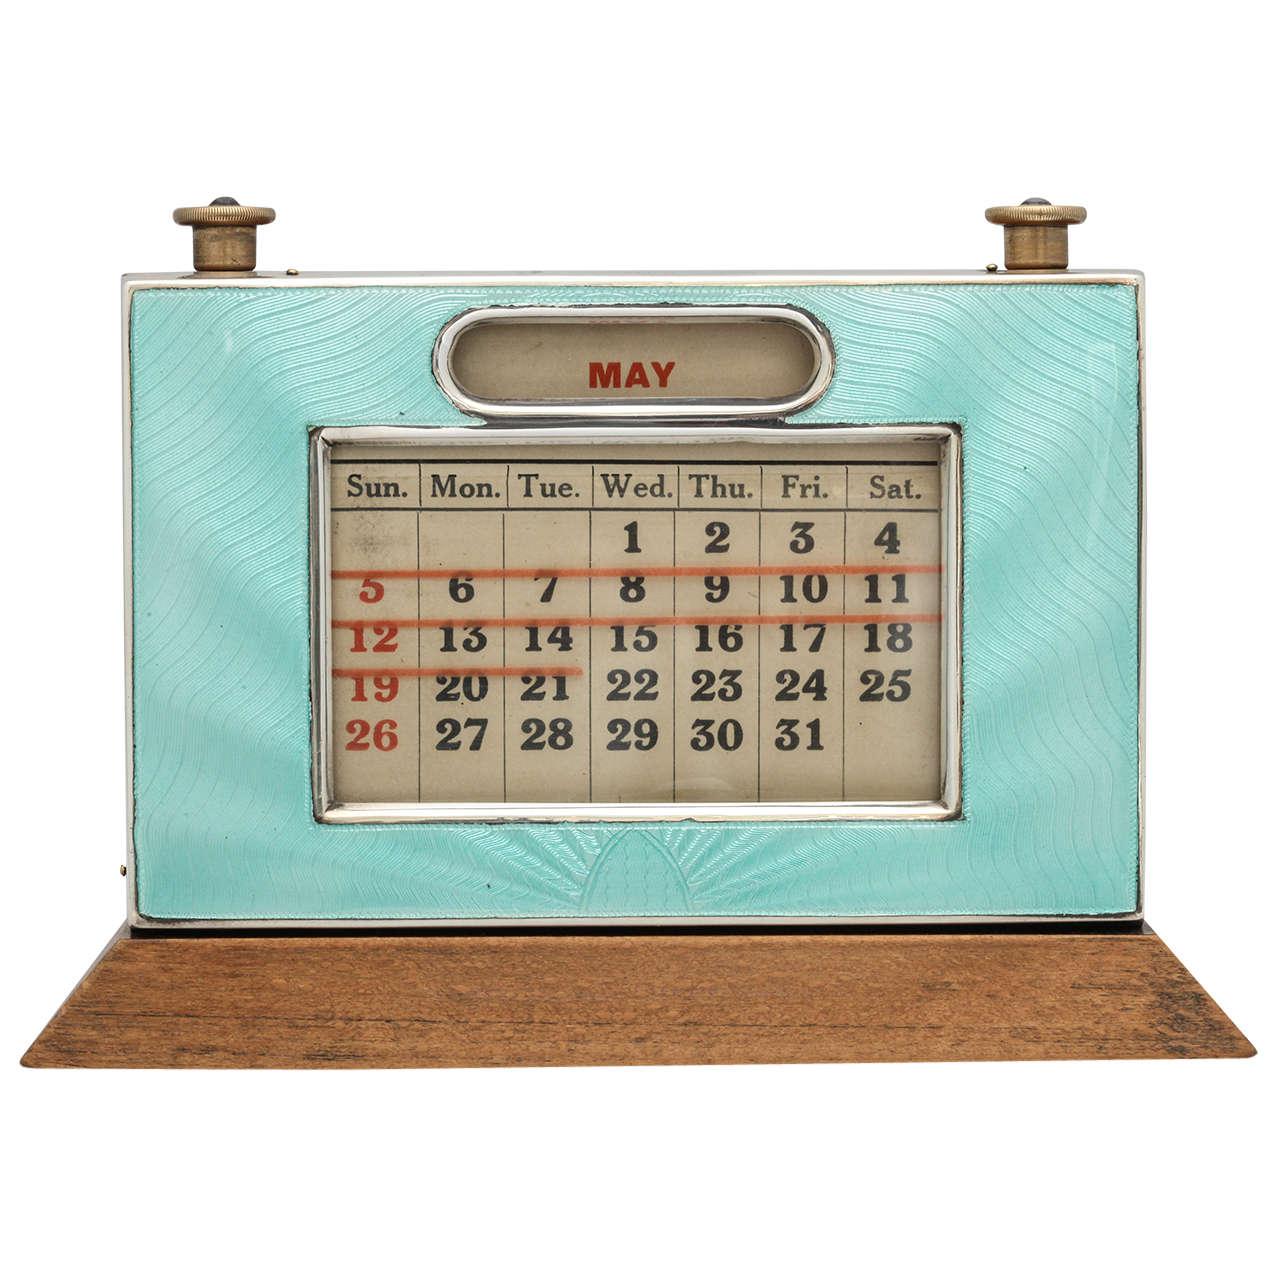 Perpetual Calendar Art Deco : Art deco sterling silver and guilloche enamel perpetual